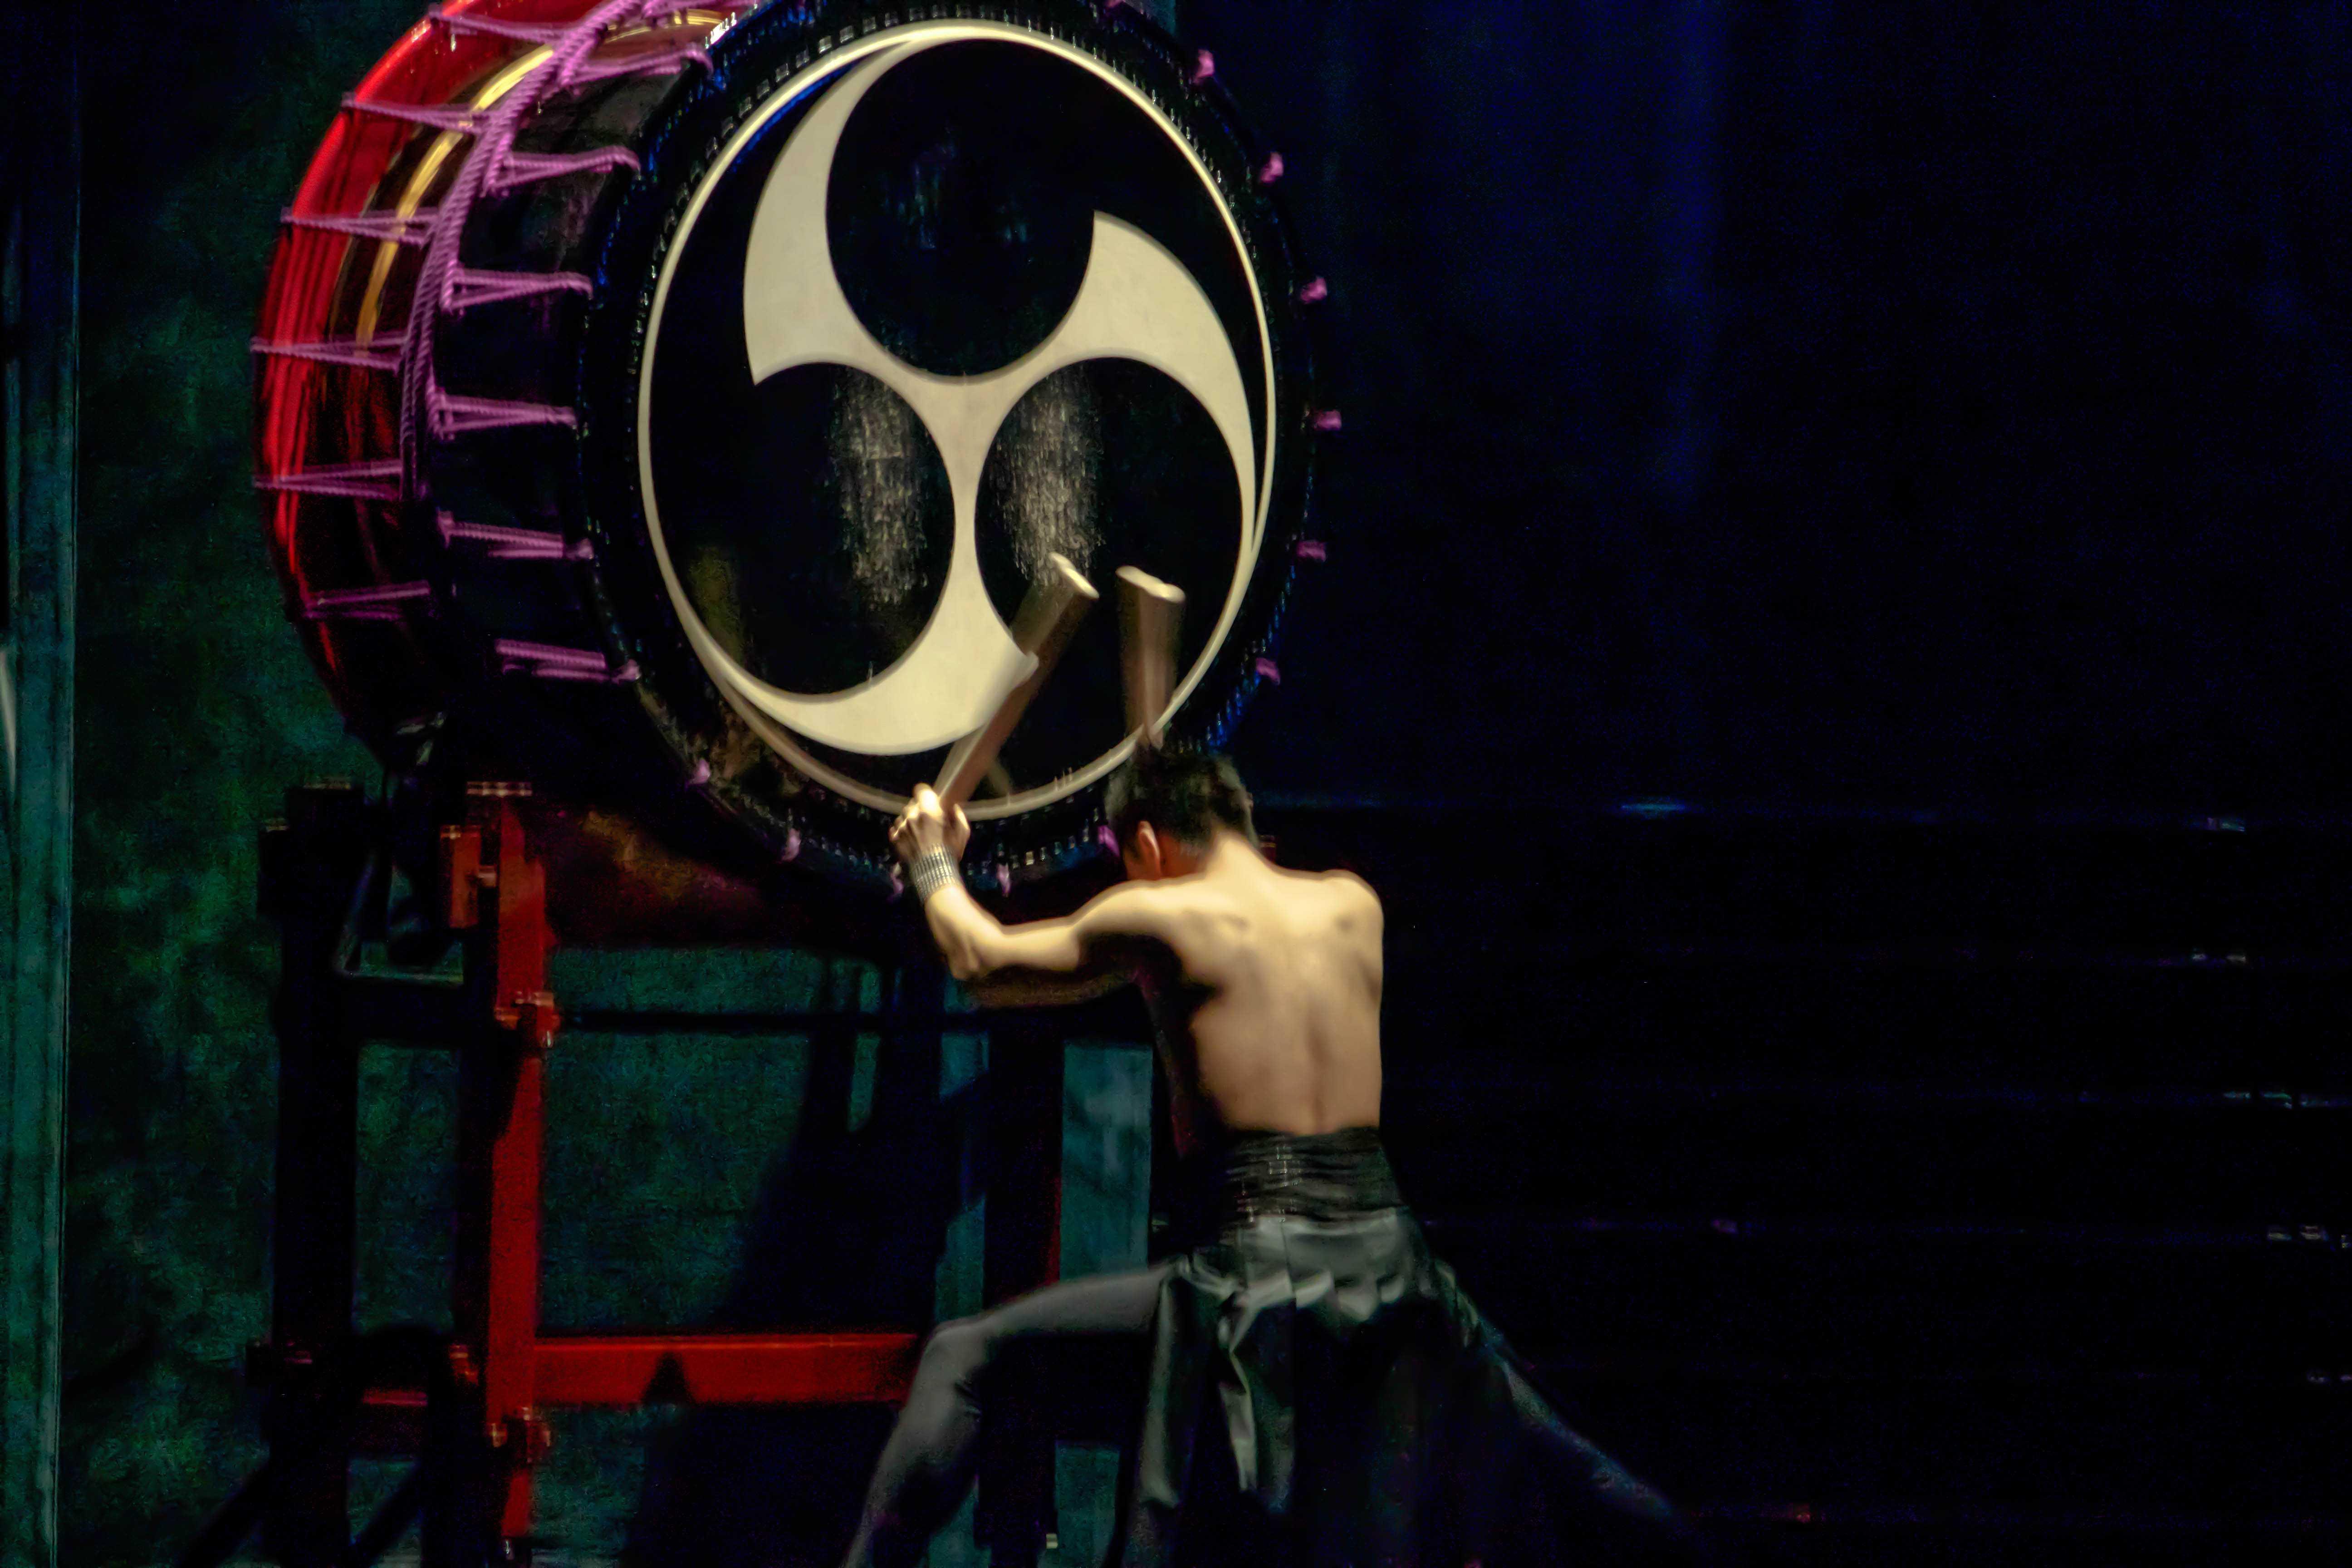 Japanese drummers represent cultural rhythm